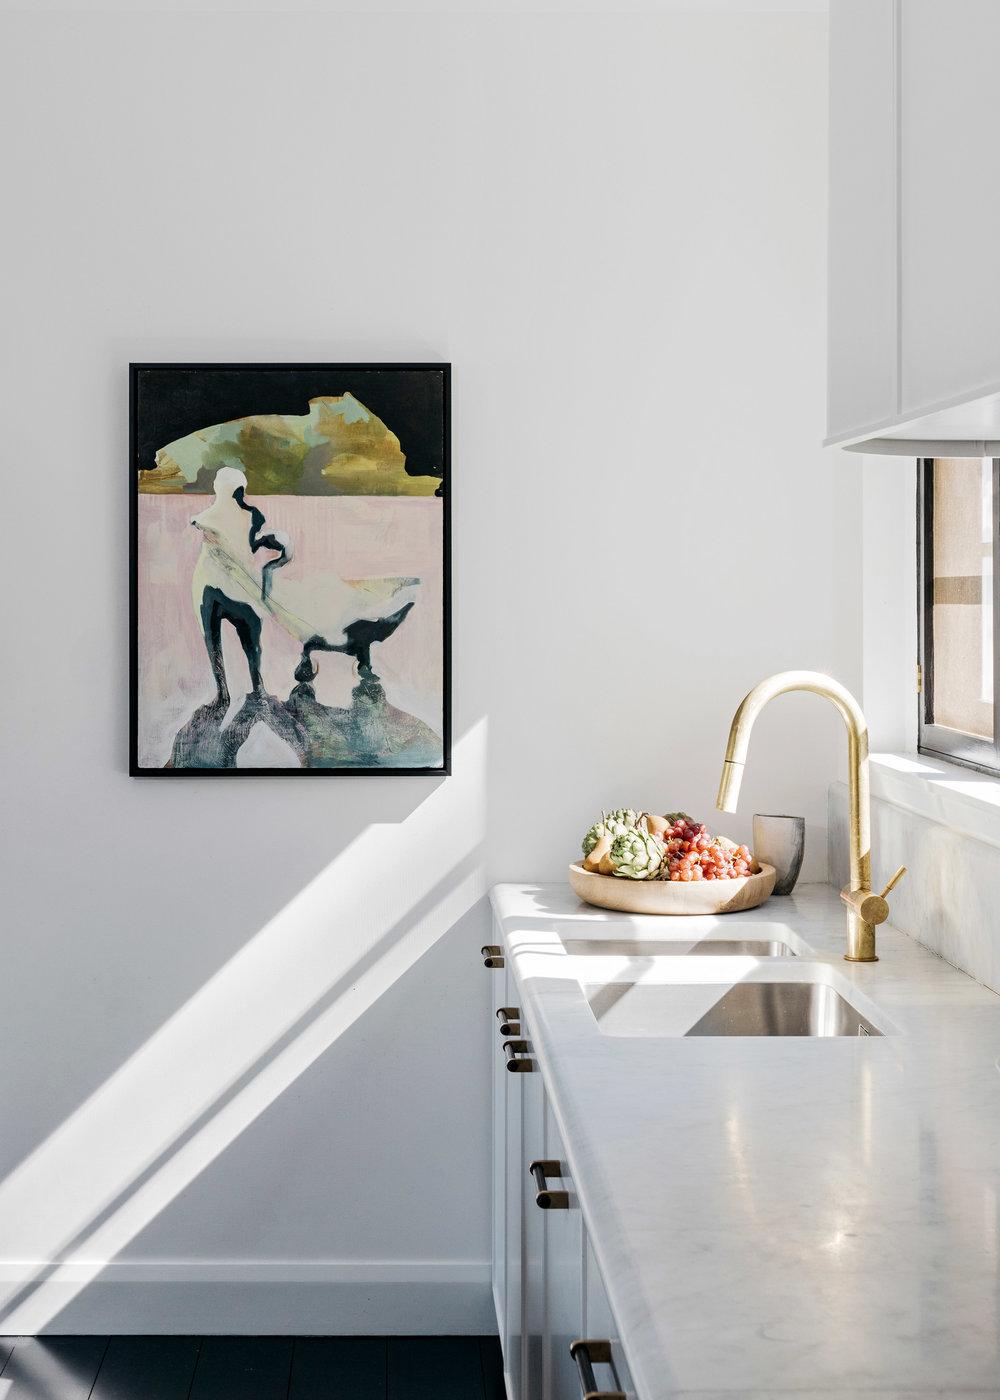 curatorial-house-arent-pyke-interiors-residential-australia-sydney_dezeen_2364_col_1.jpg